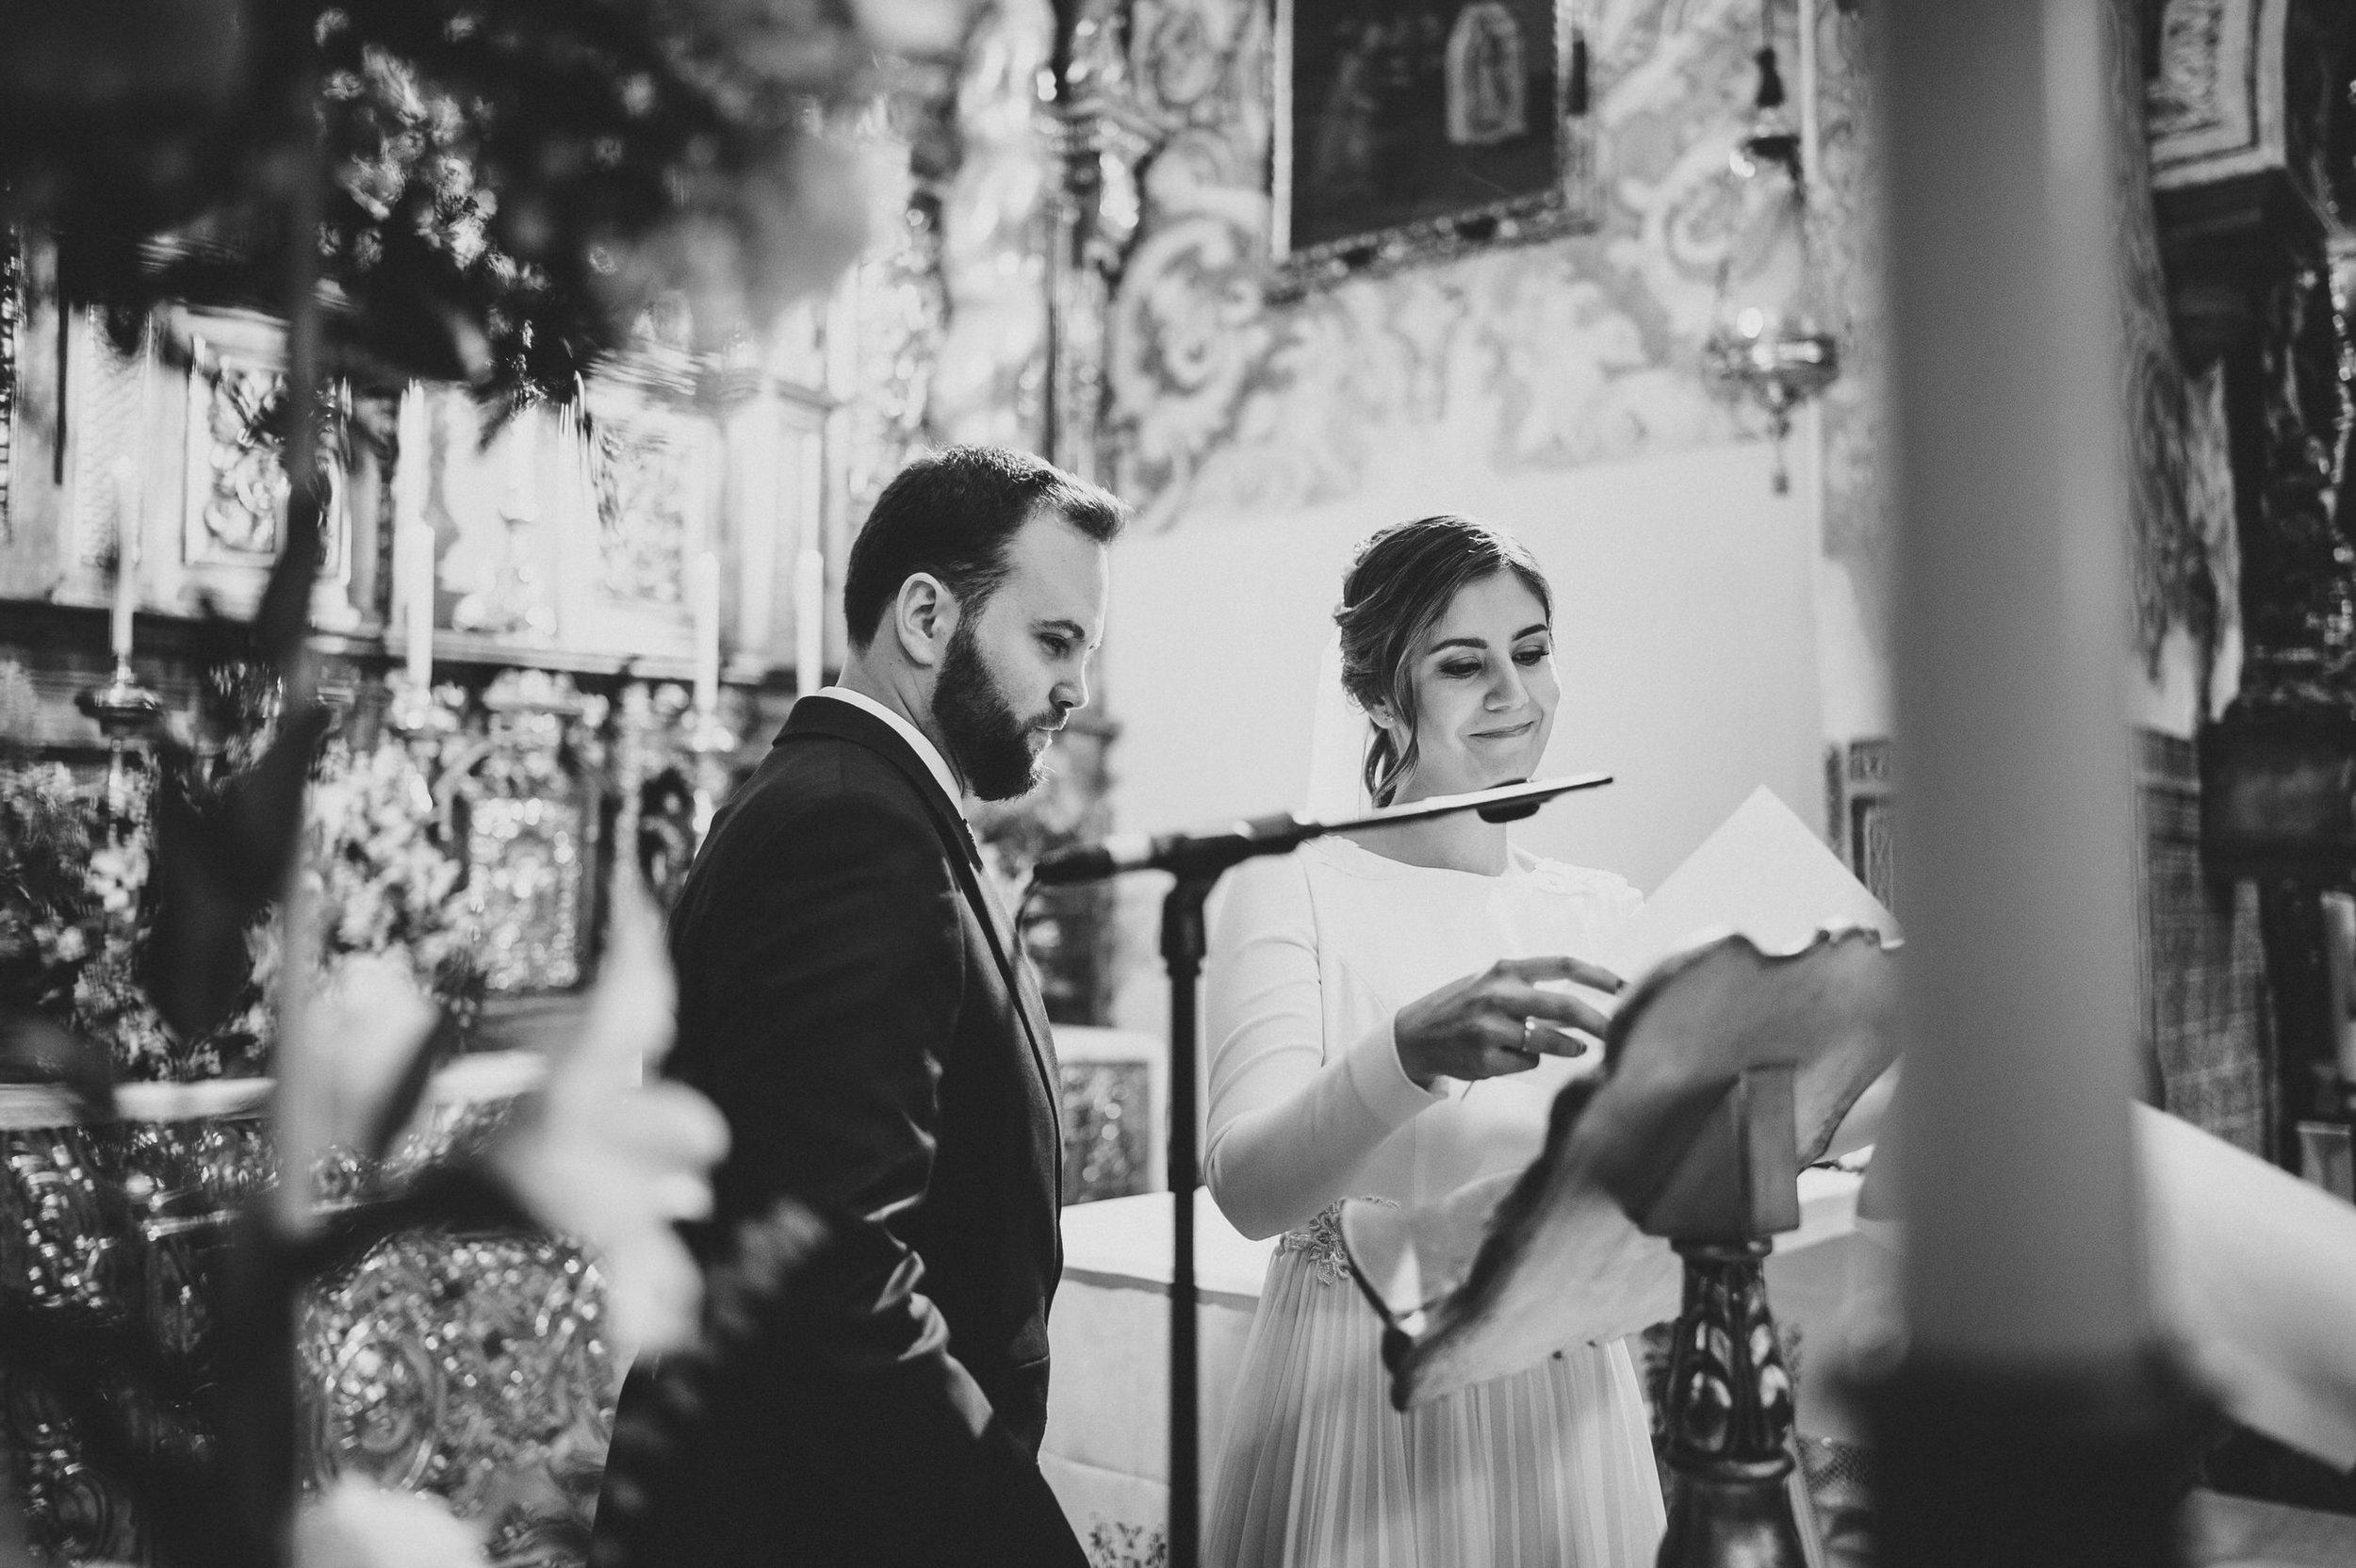 andres+amarillo+fotografo+boda+sevilla+santa+maria+de+la+blanca+al+yamanah (2).JPG